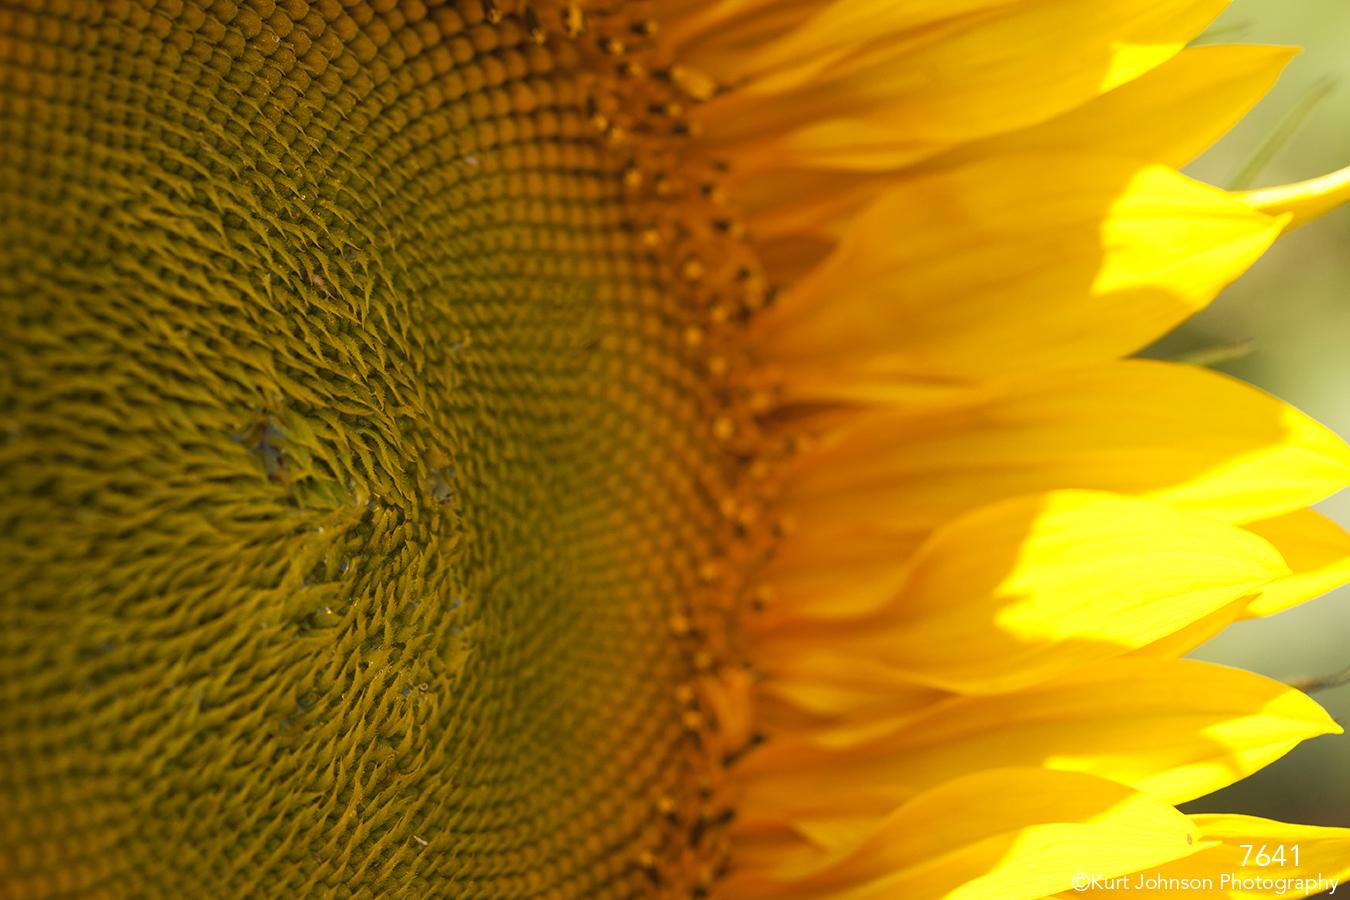 flower sunflower close up detail texture abstract yellow petals